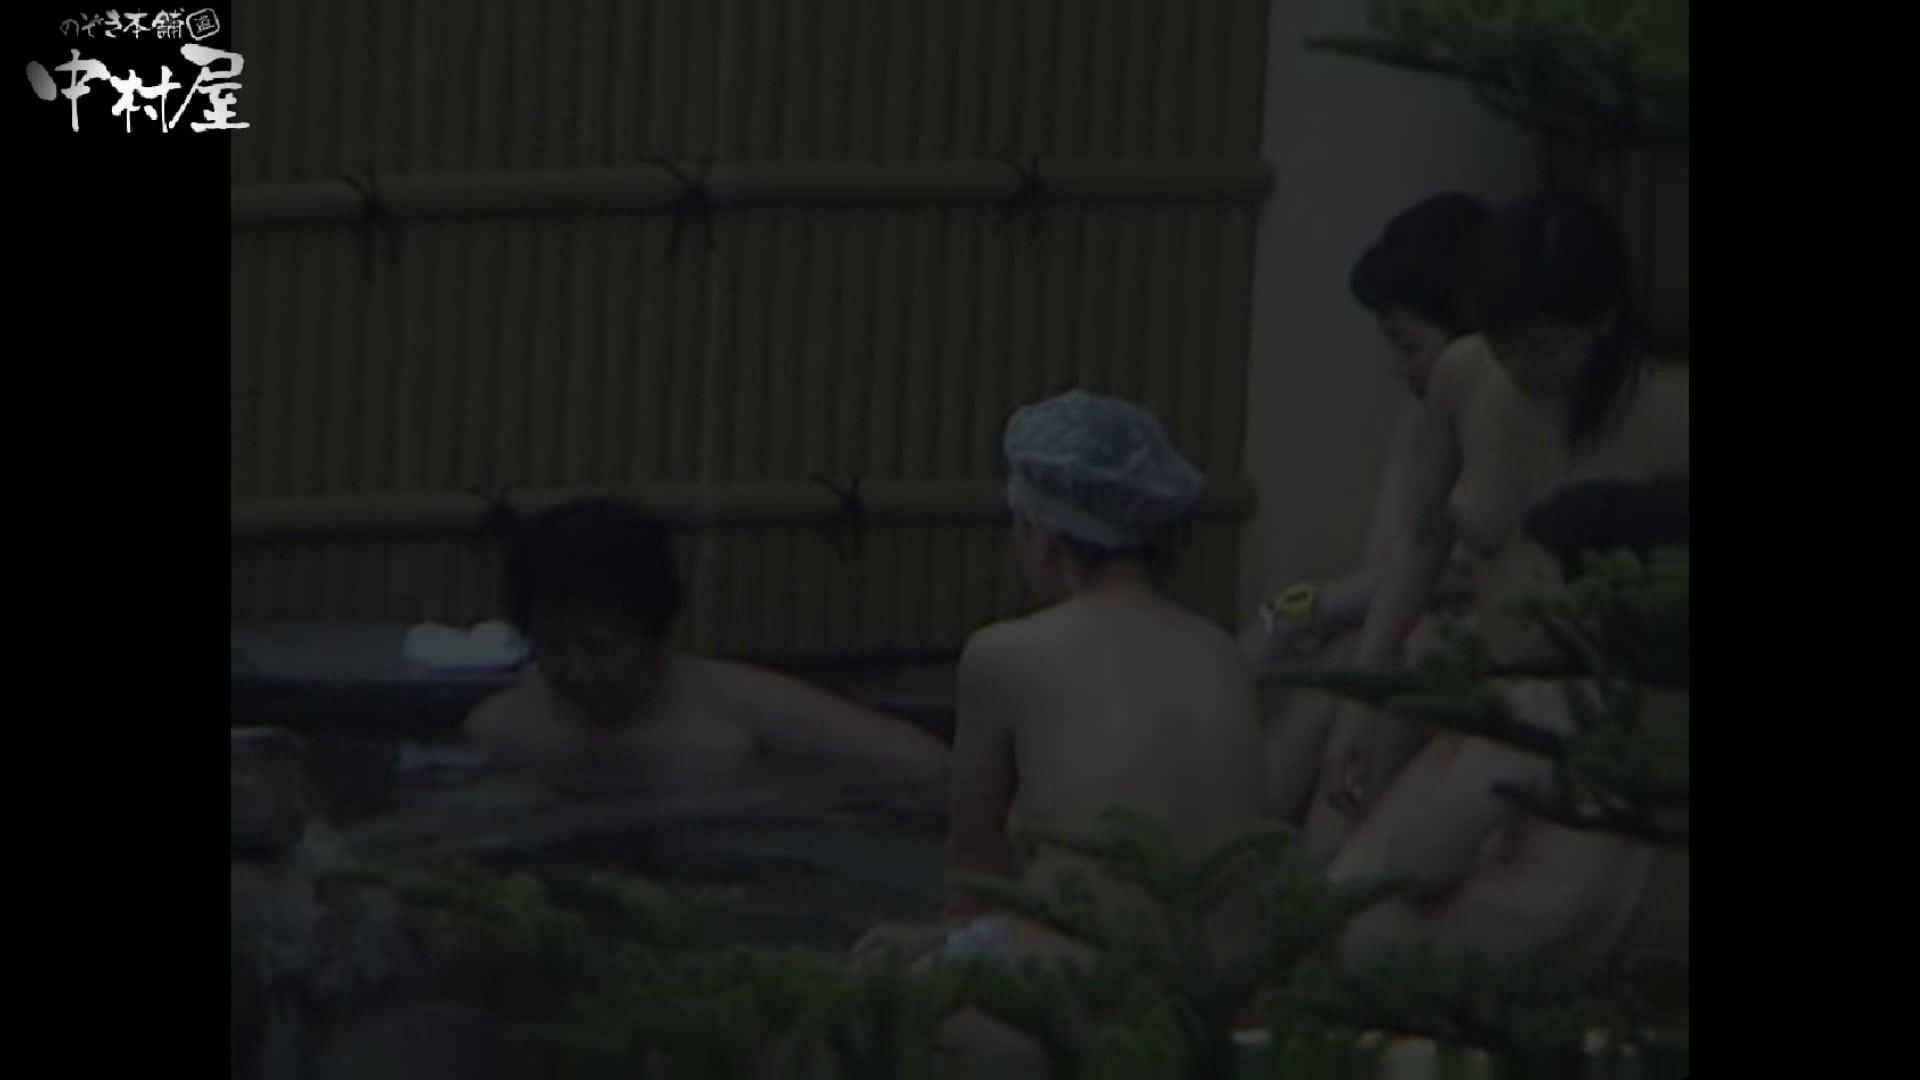 Aquaな露天風呂Vol.962 盗撮 性交動画流出 35連発 2